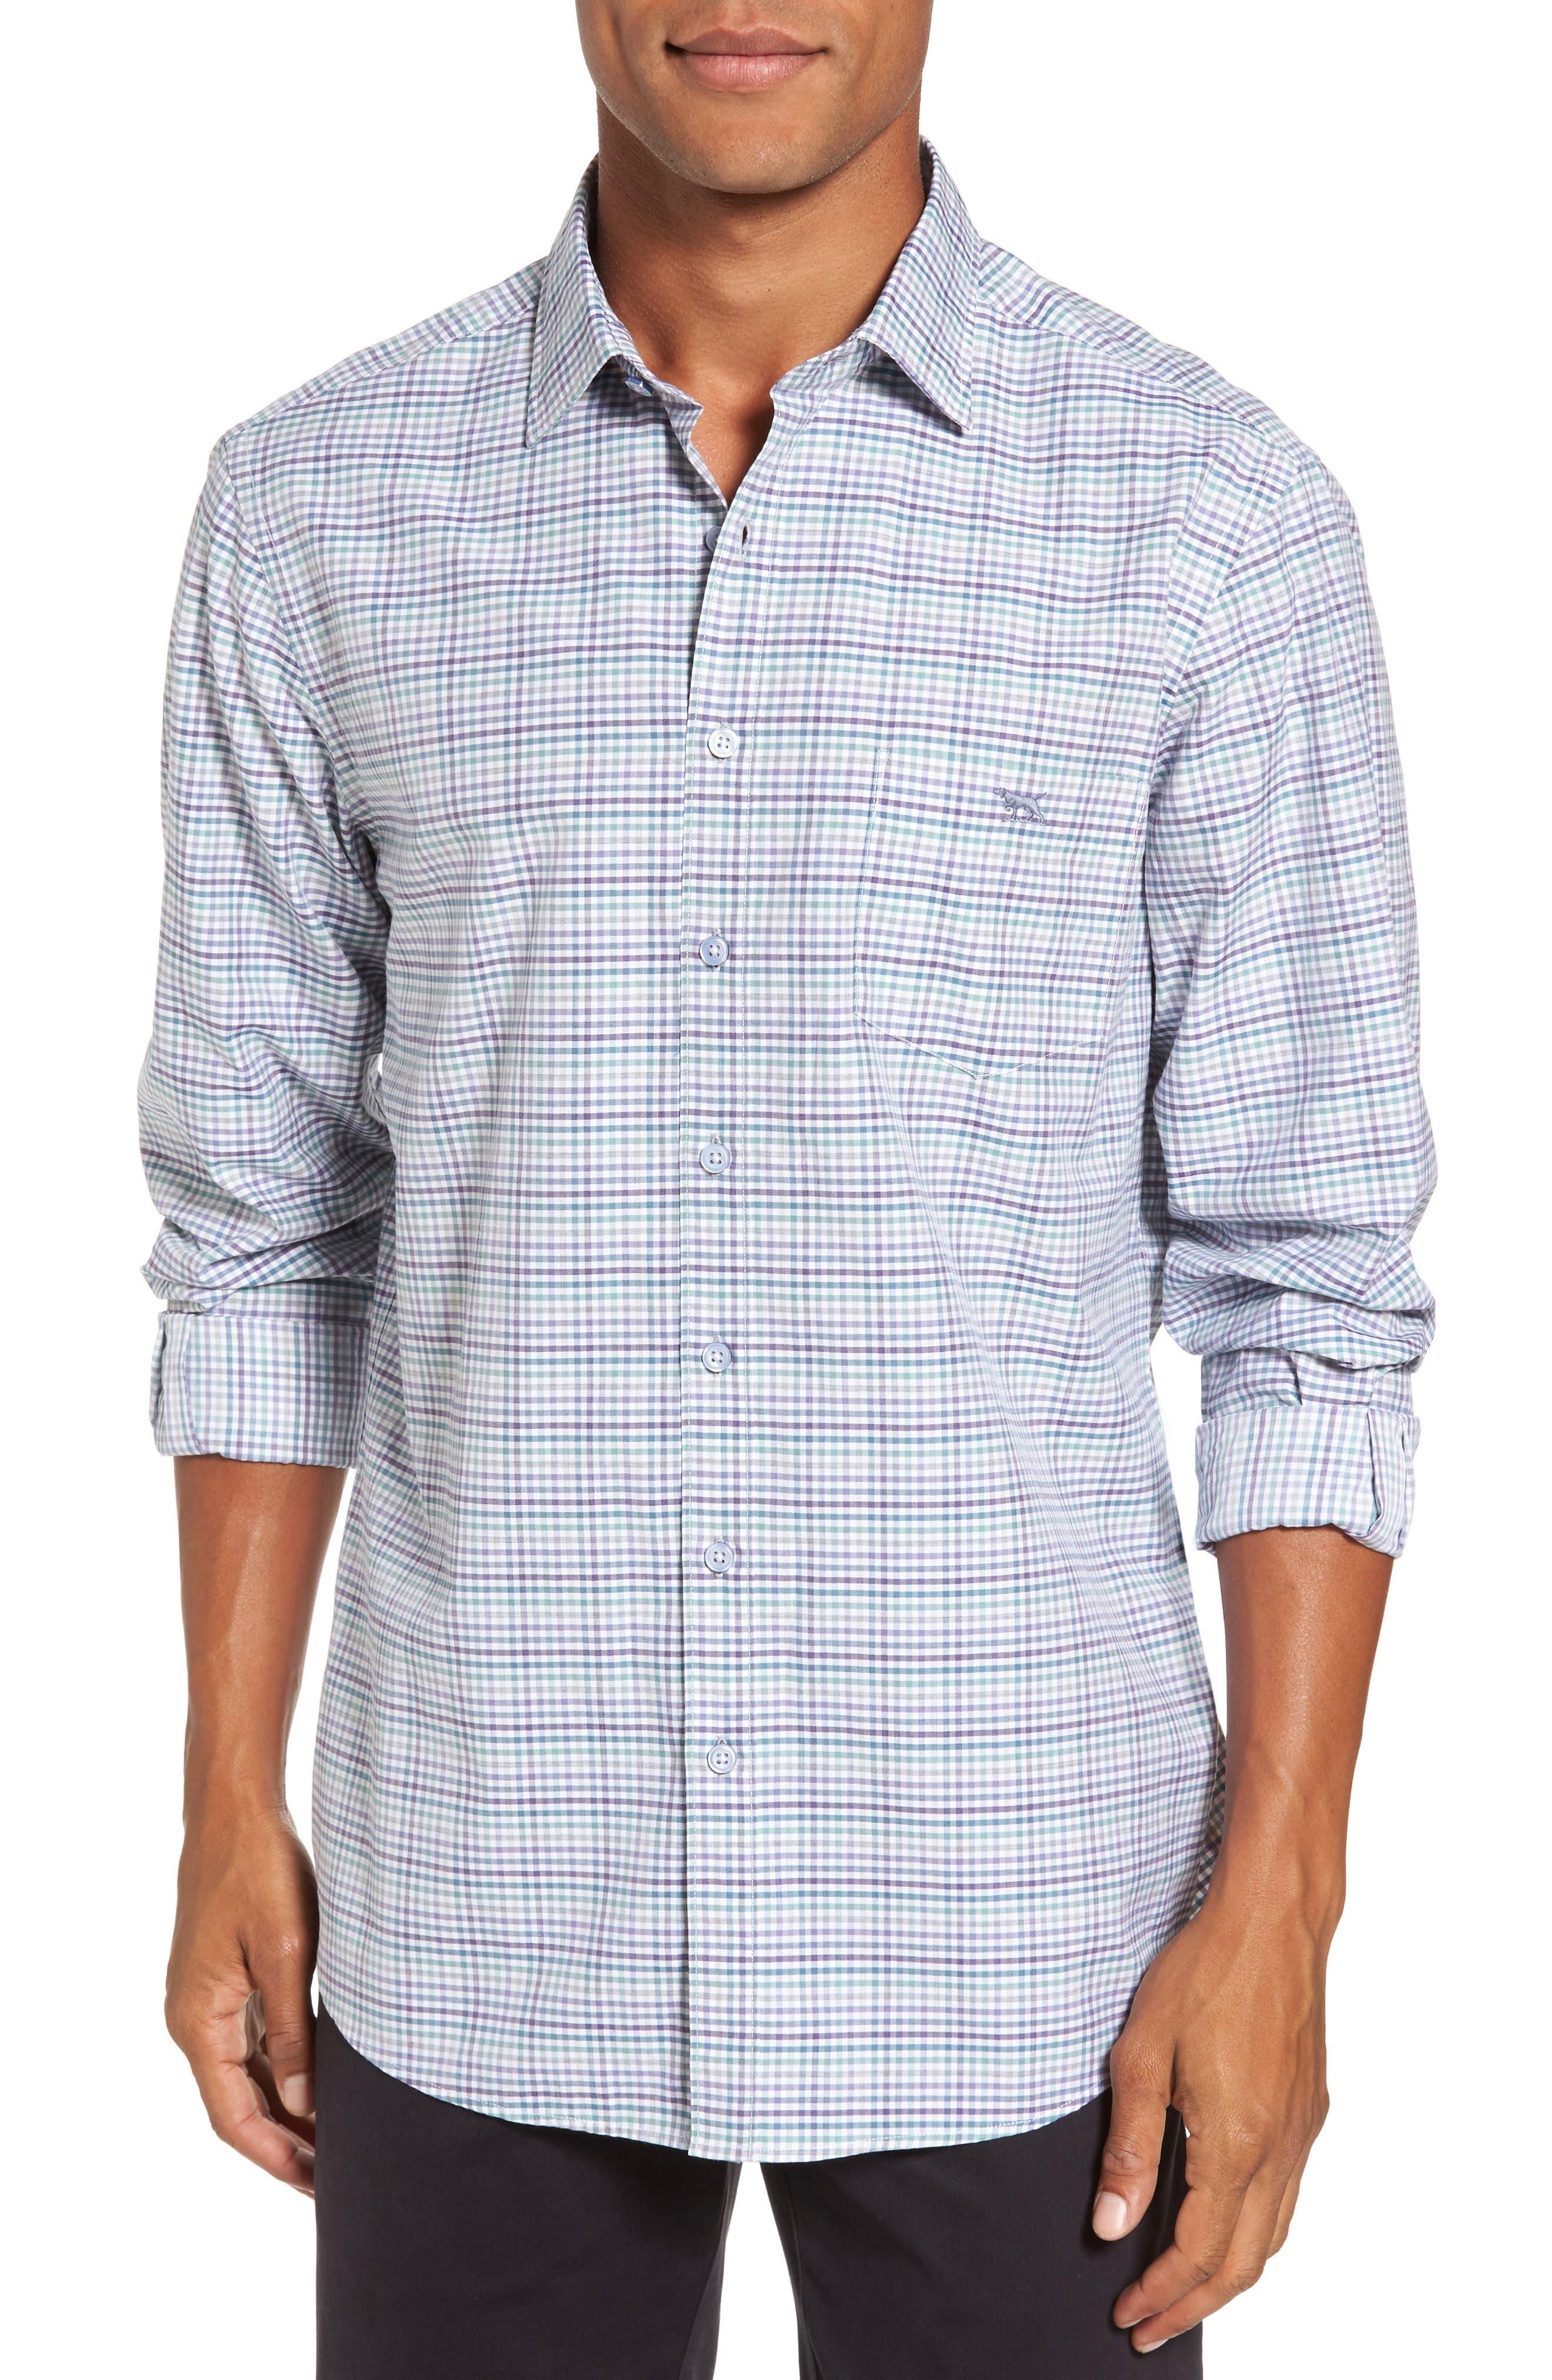 Alternate Image 1 Selected - Rodd & Gunn Woodlaw Original Fit Check Sport Shirt